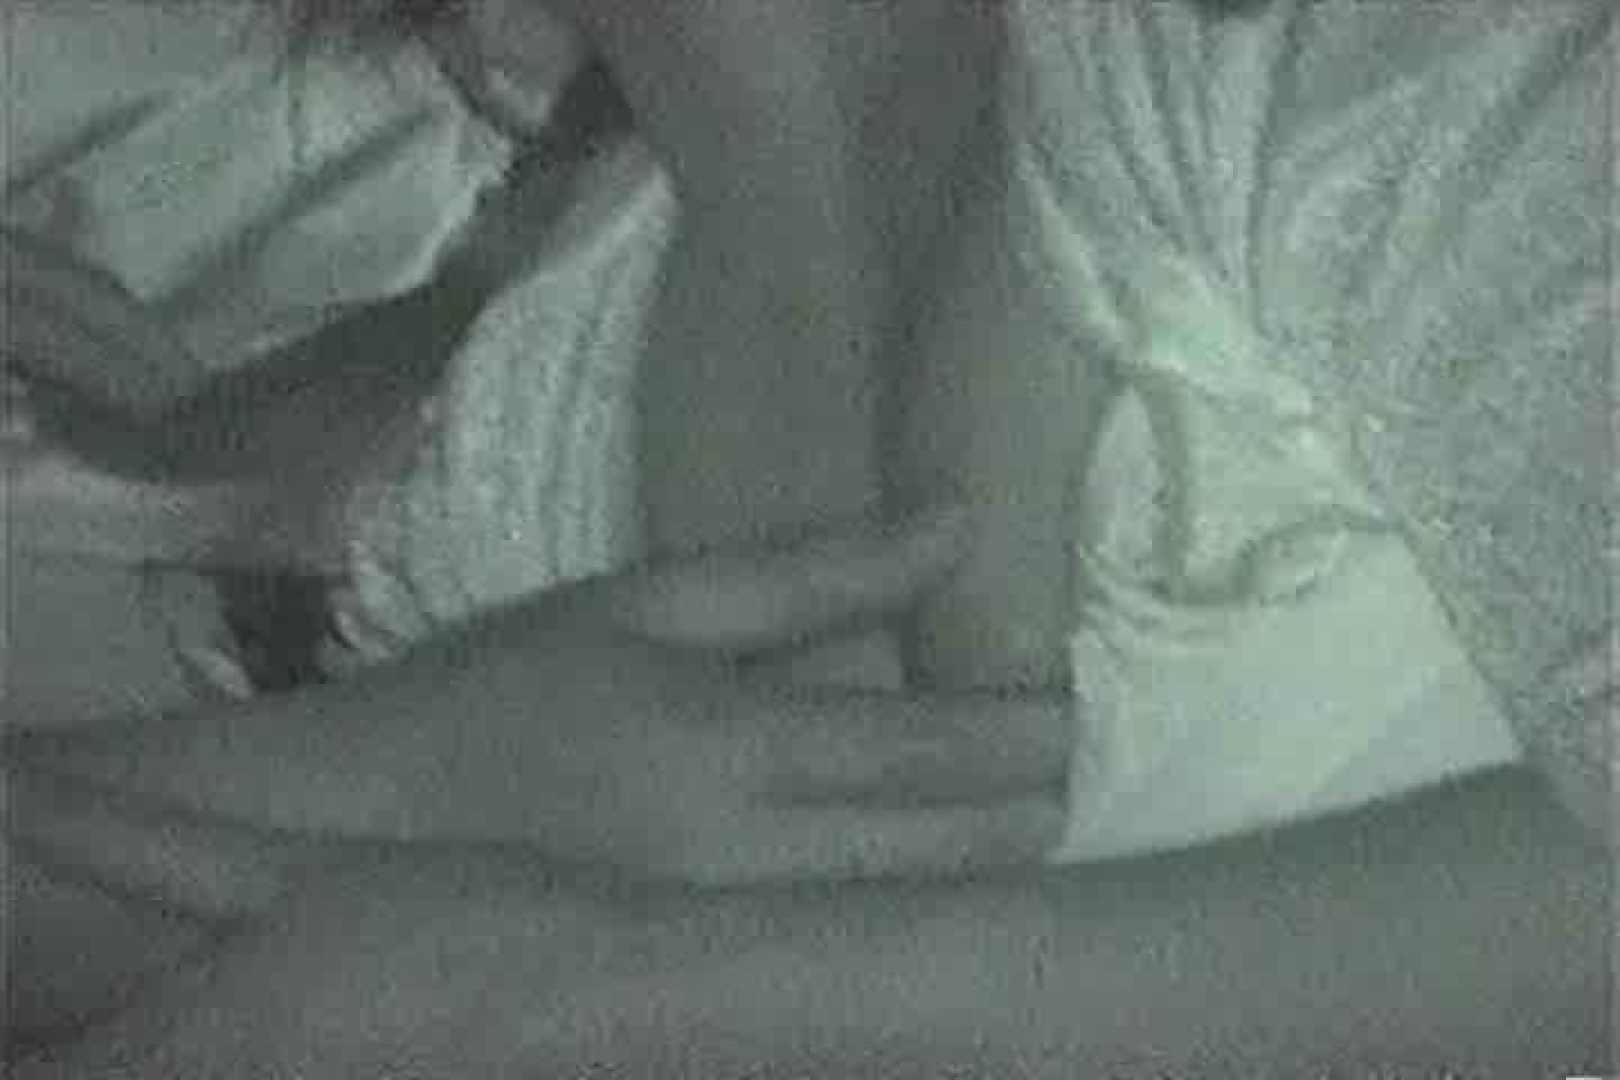 MASAさんの待ち伏せ撮り! 赤外線カーセックスVol.18 セックス流出映像  90連発 70